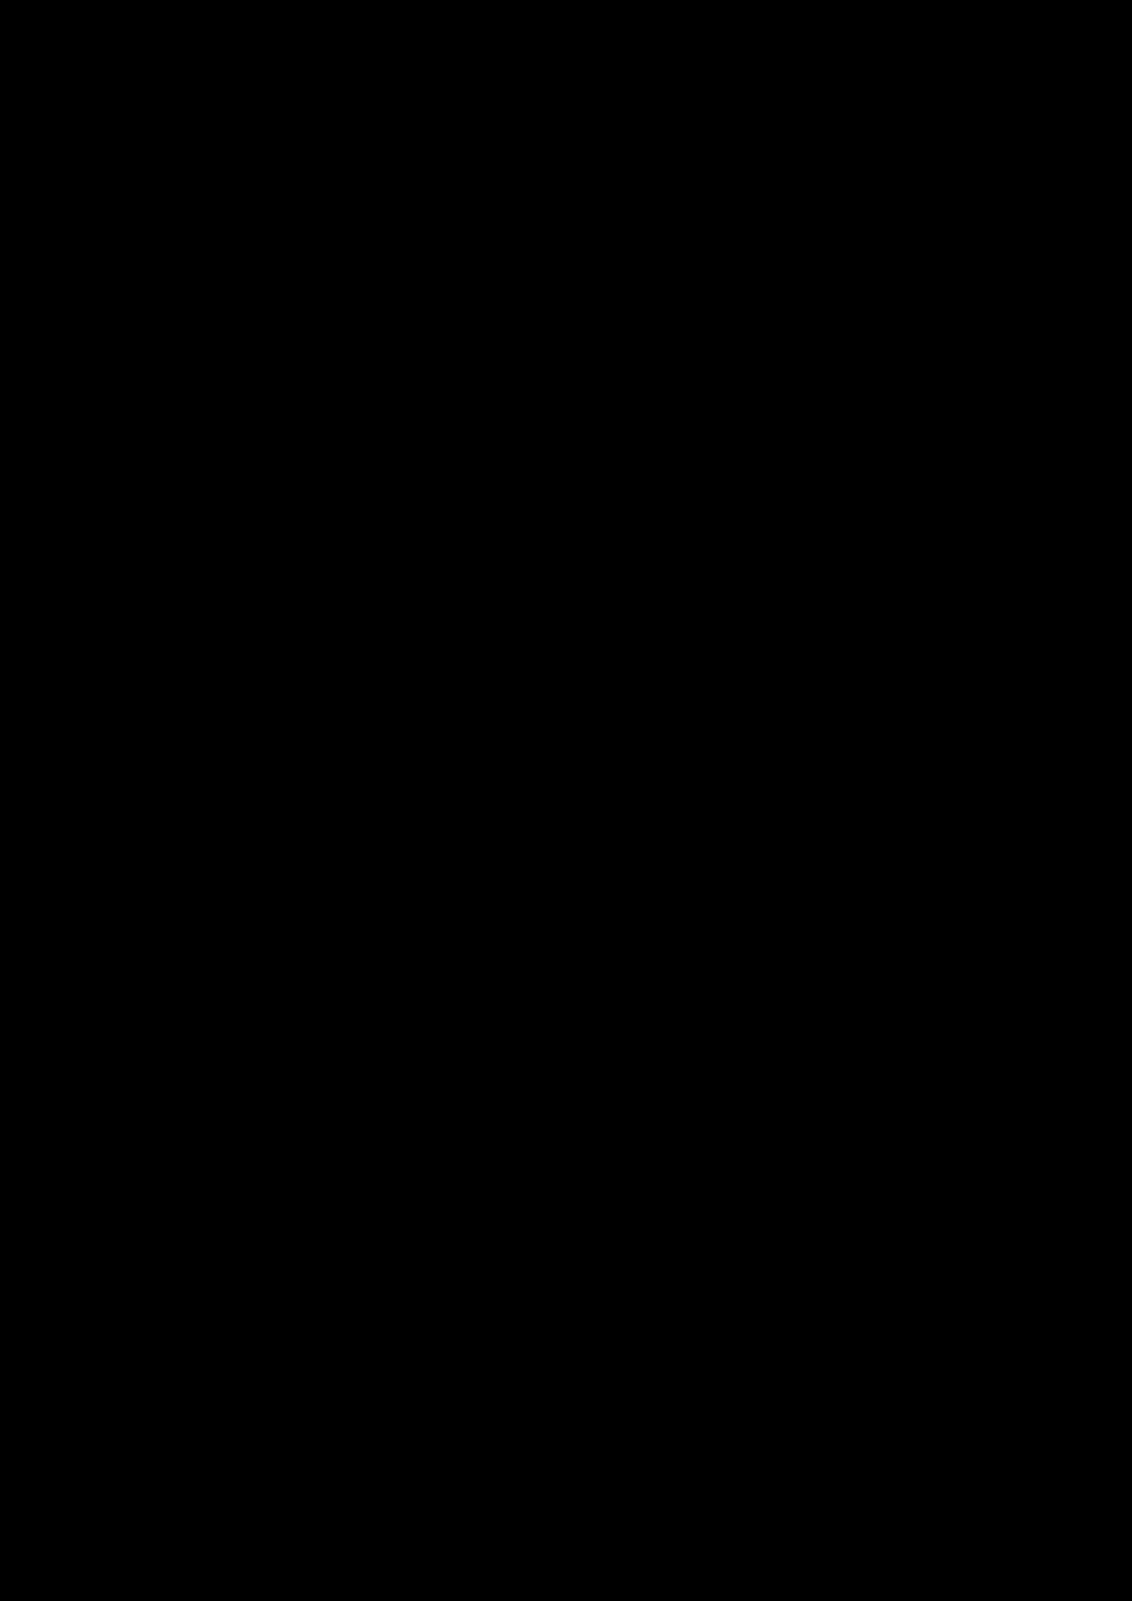 Belyiy sokol slide, Image 197